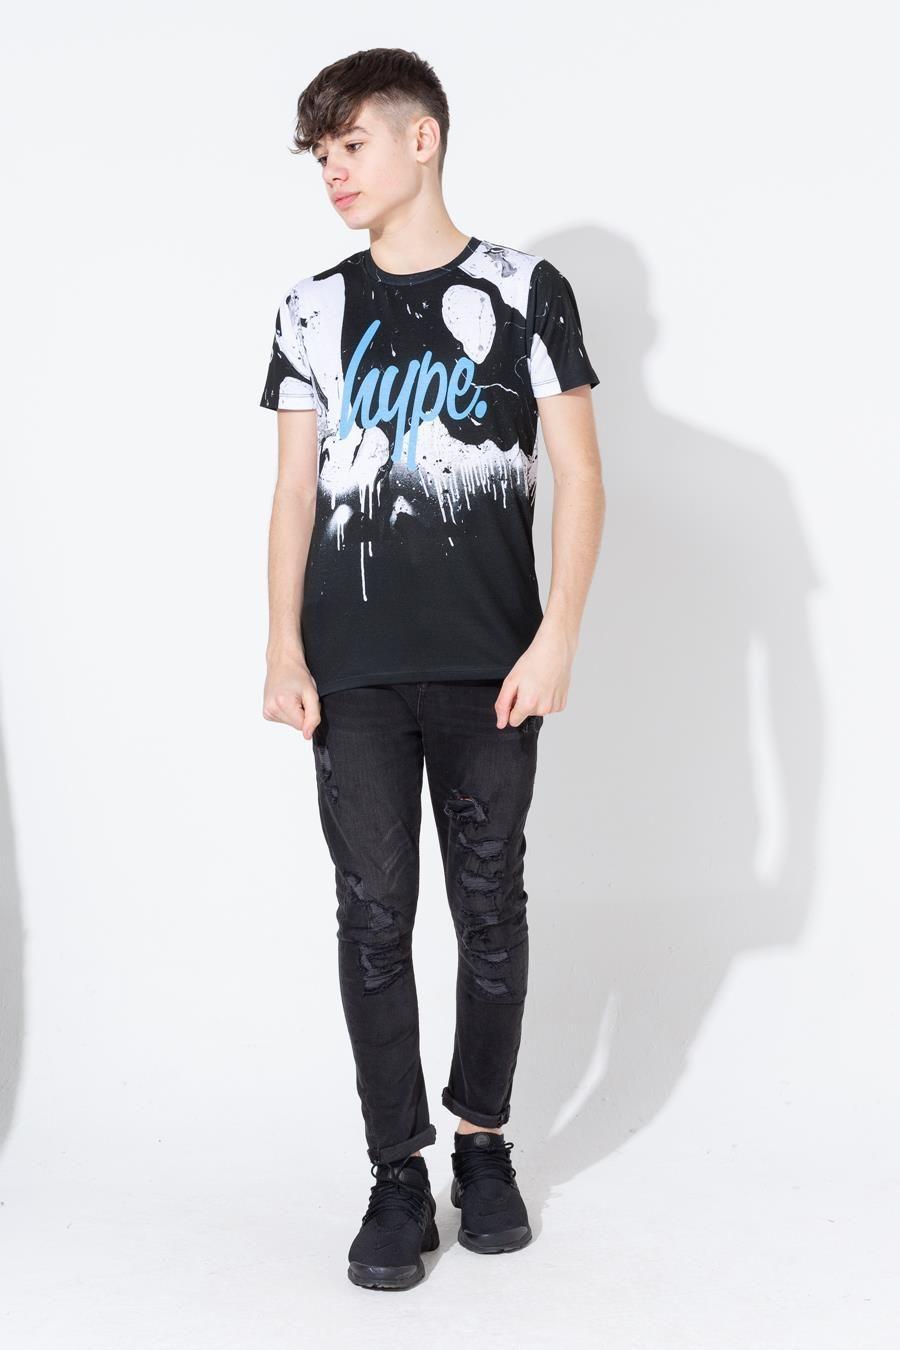 Hype Mono Marble Drips Kids T-Shirt